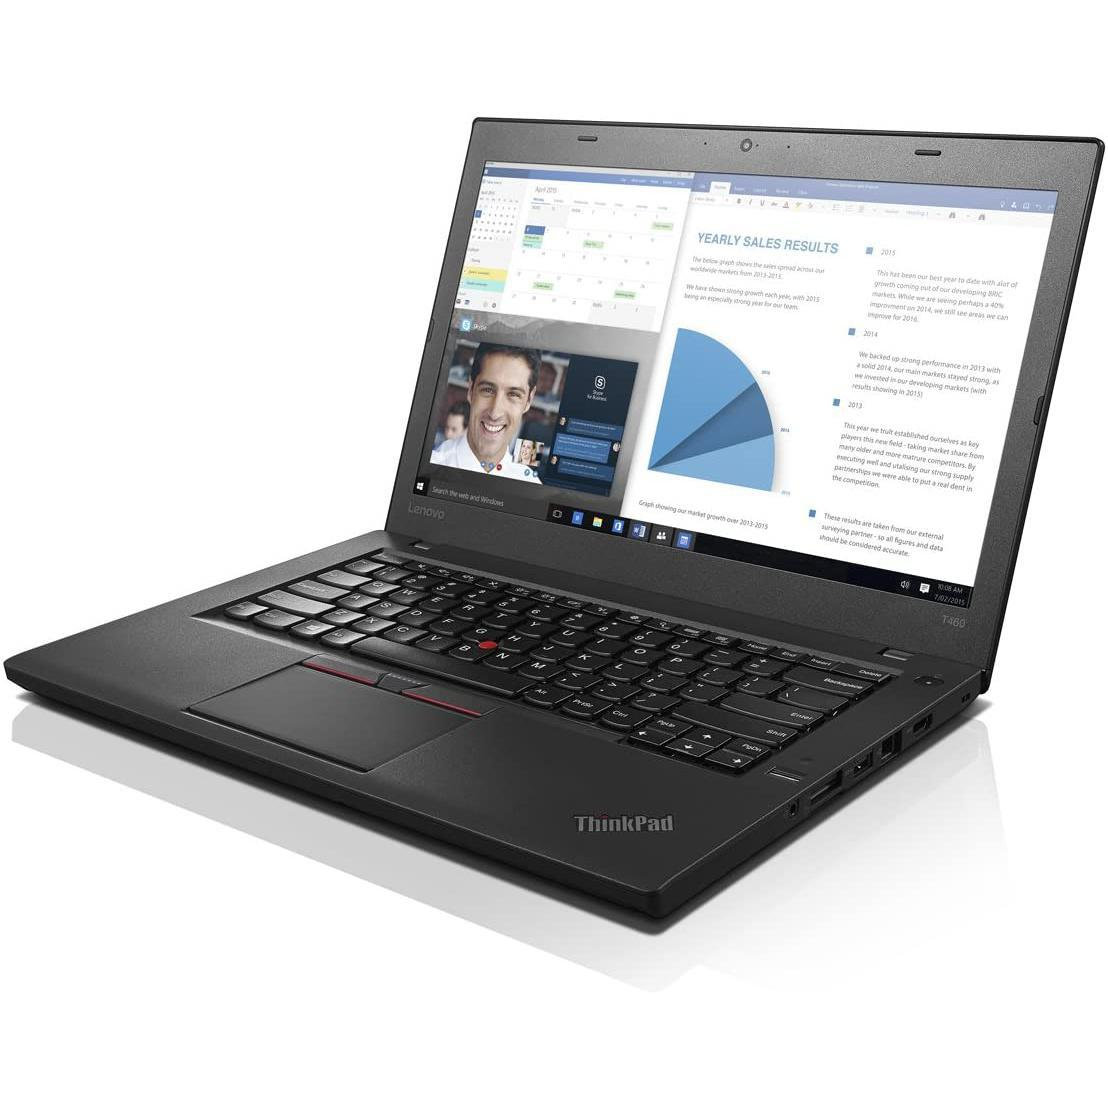 Lenovo ThinkPad T460 14-inch (2016) - Core i5-6300U - 8 GB - SSD 240 GB